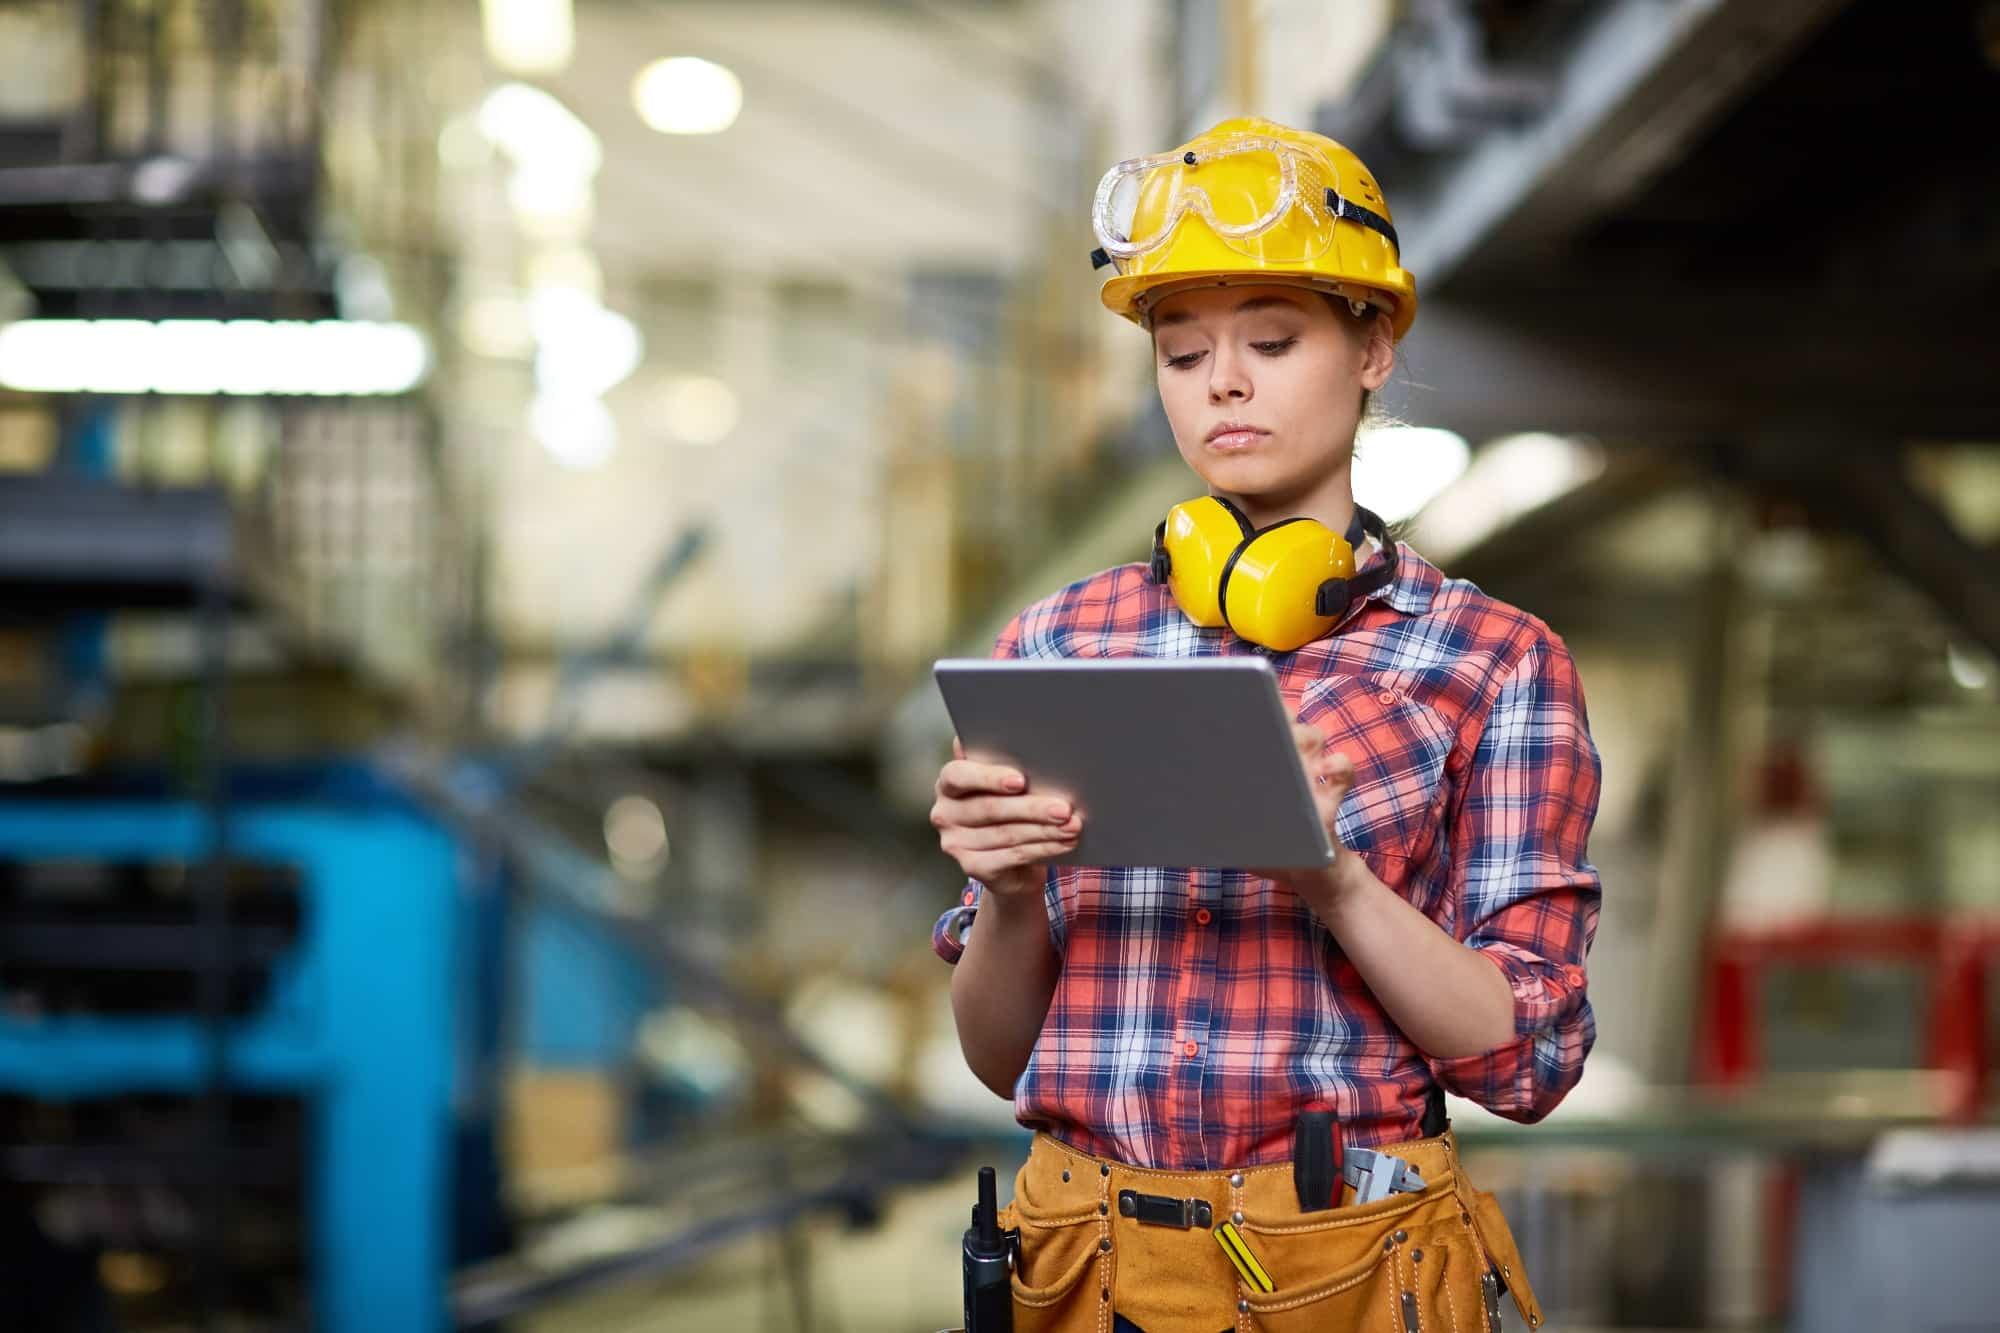 Schritt für Schritt zur digitalen Baustelle